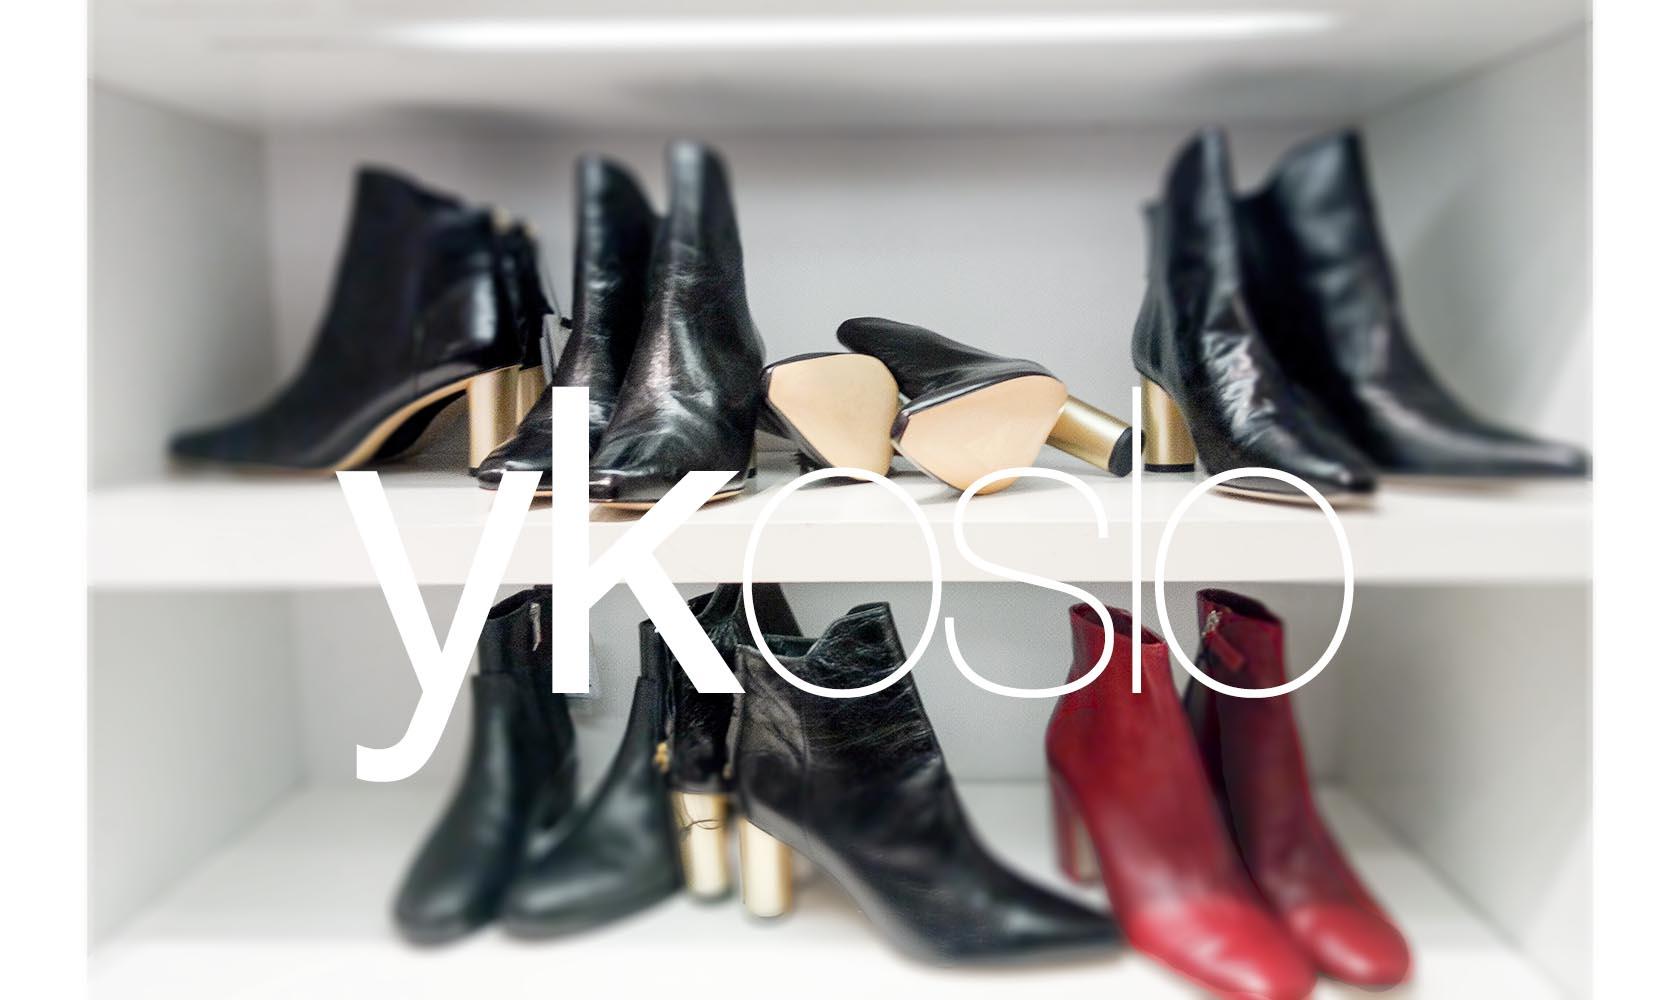 ykoslo__7